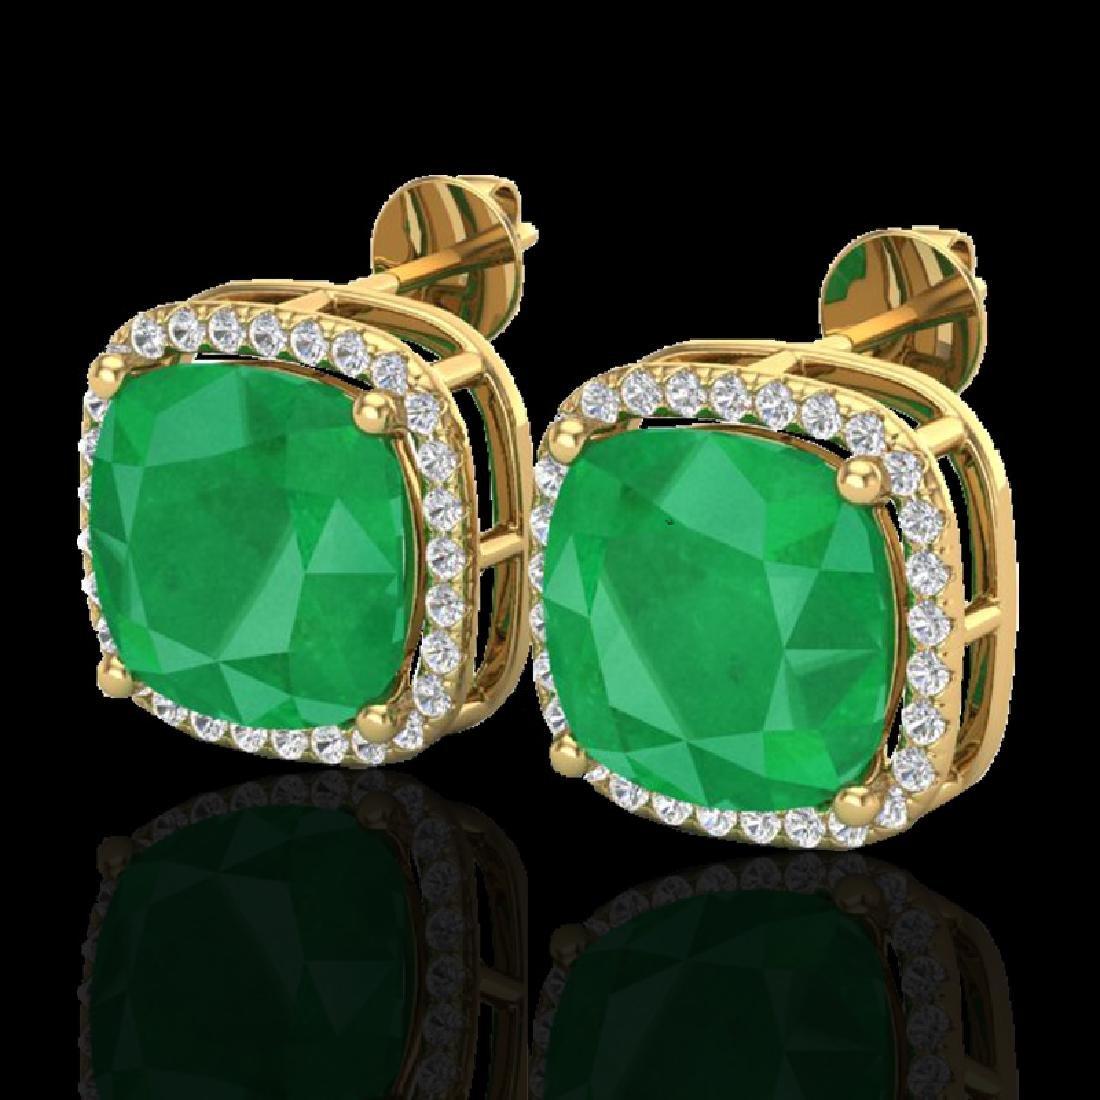 12 CTW Emerald & Micro Pave Halo VS/SI Diamond Earrings